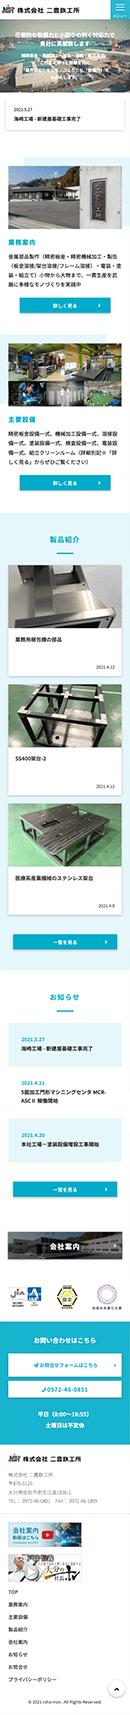 Webマーケティング_制作実績_株式会社 二豊鉃工所_3